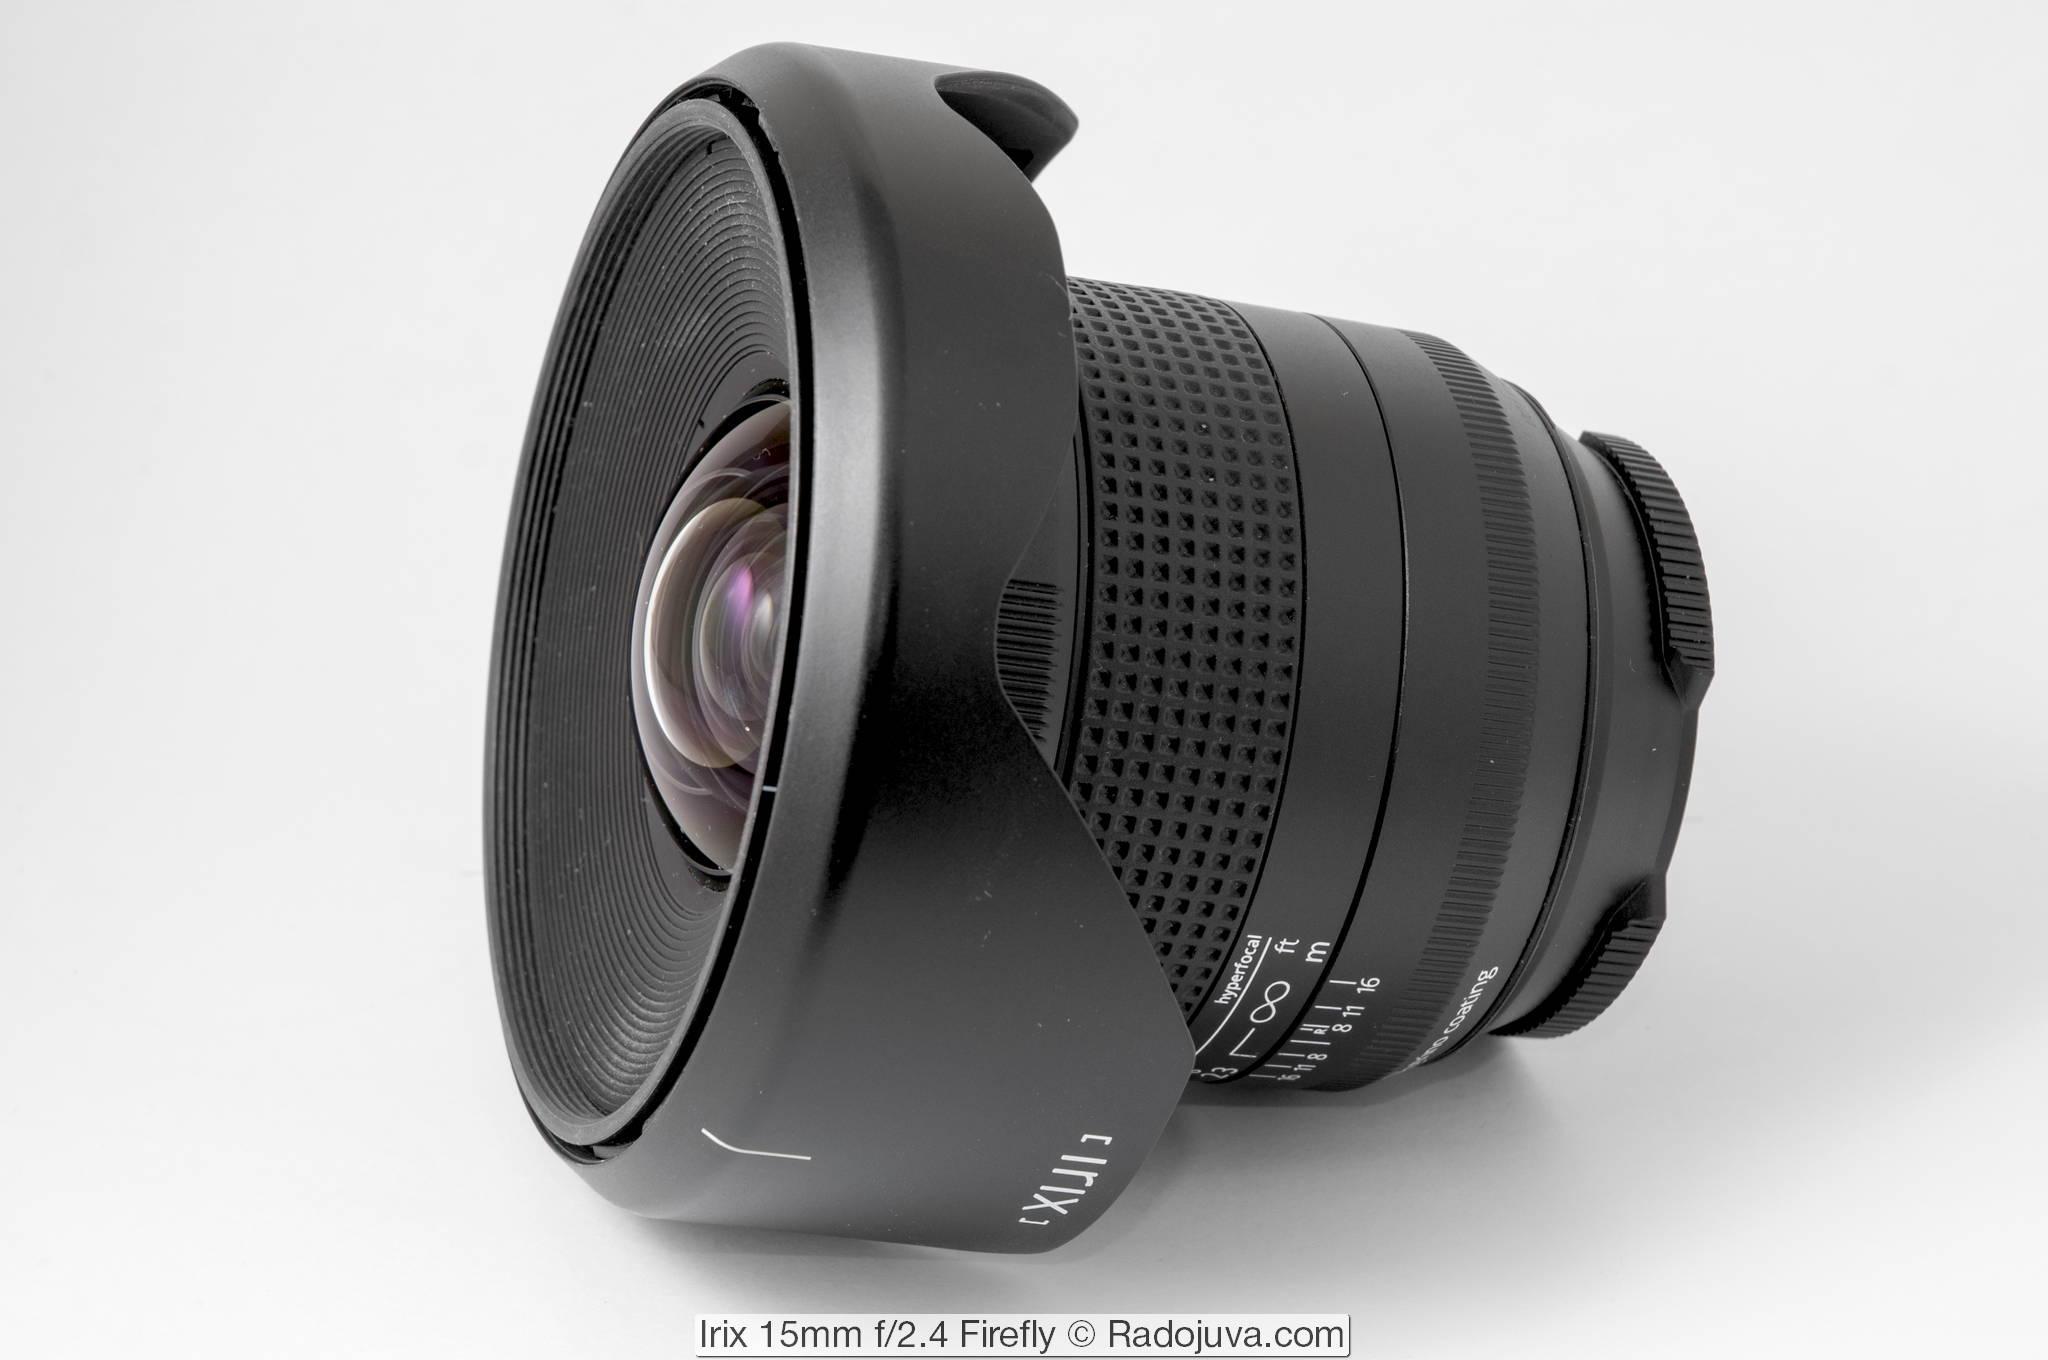 Irix 15mm f/2.4 Firefly